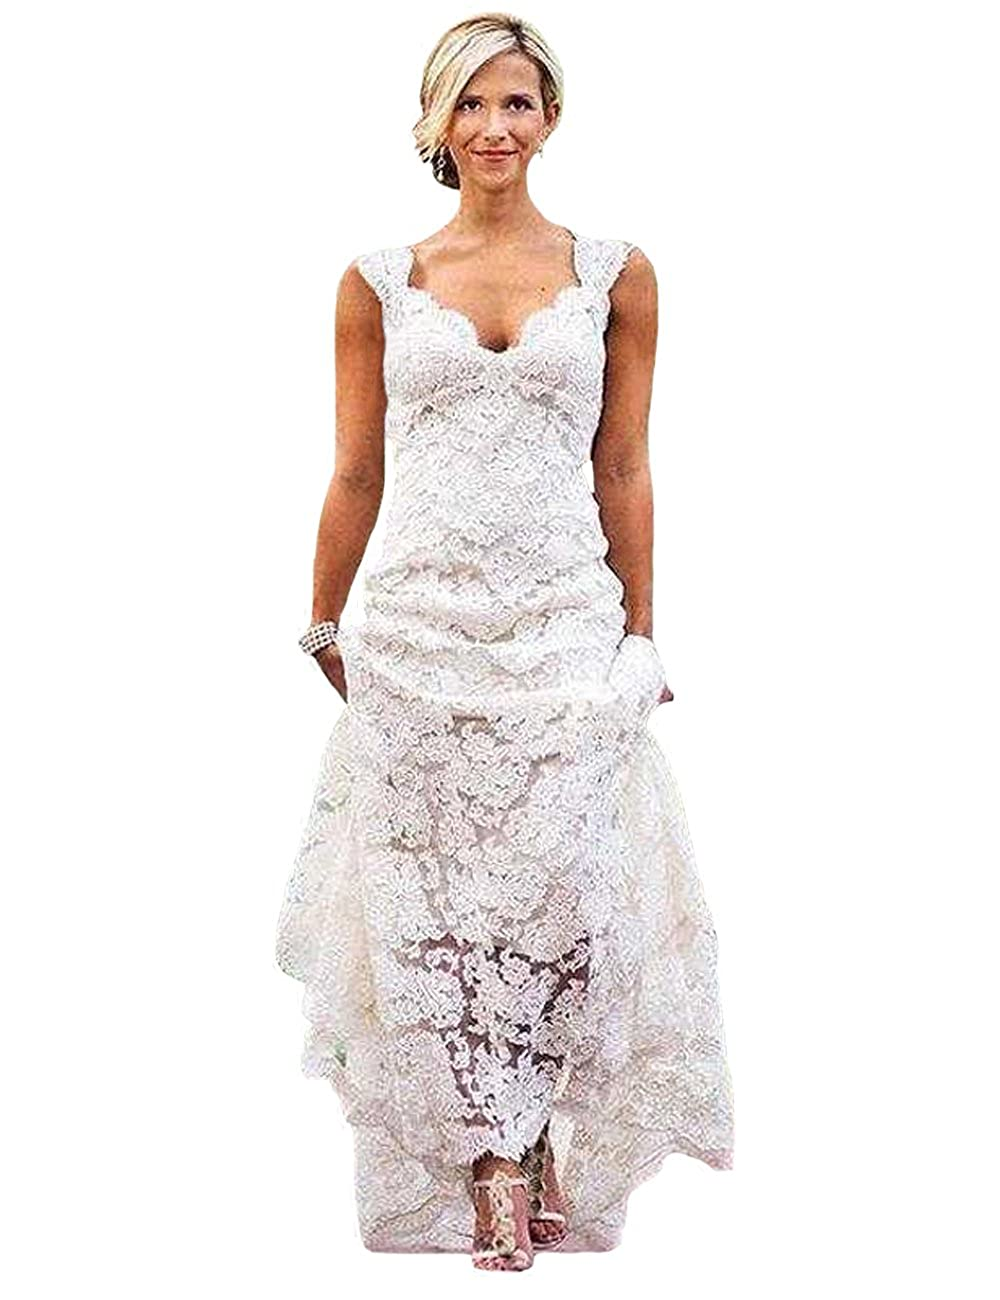 O.D.W Spitze Lange Frauen Brautkleider Rustikale Vintage ...